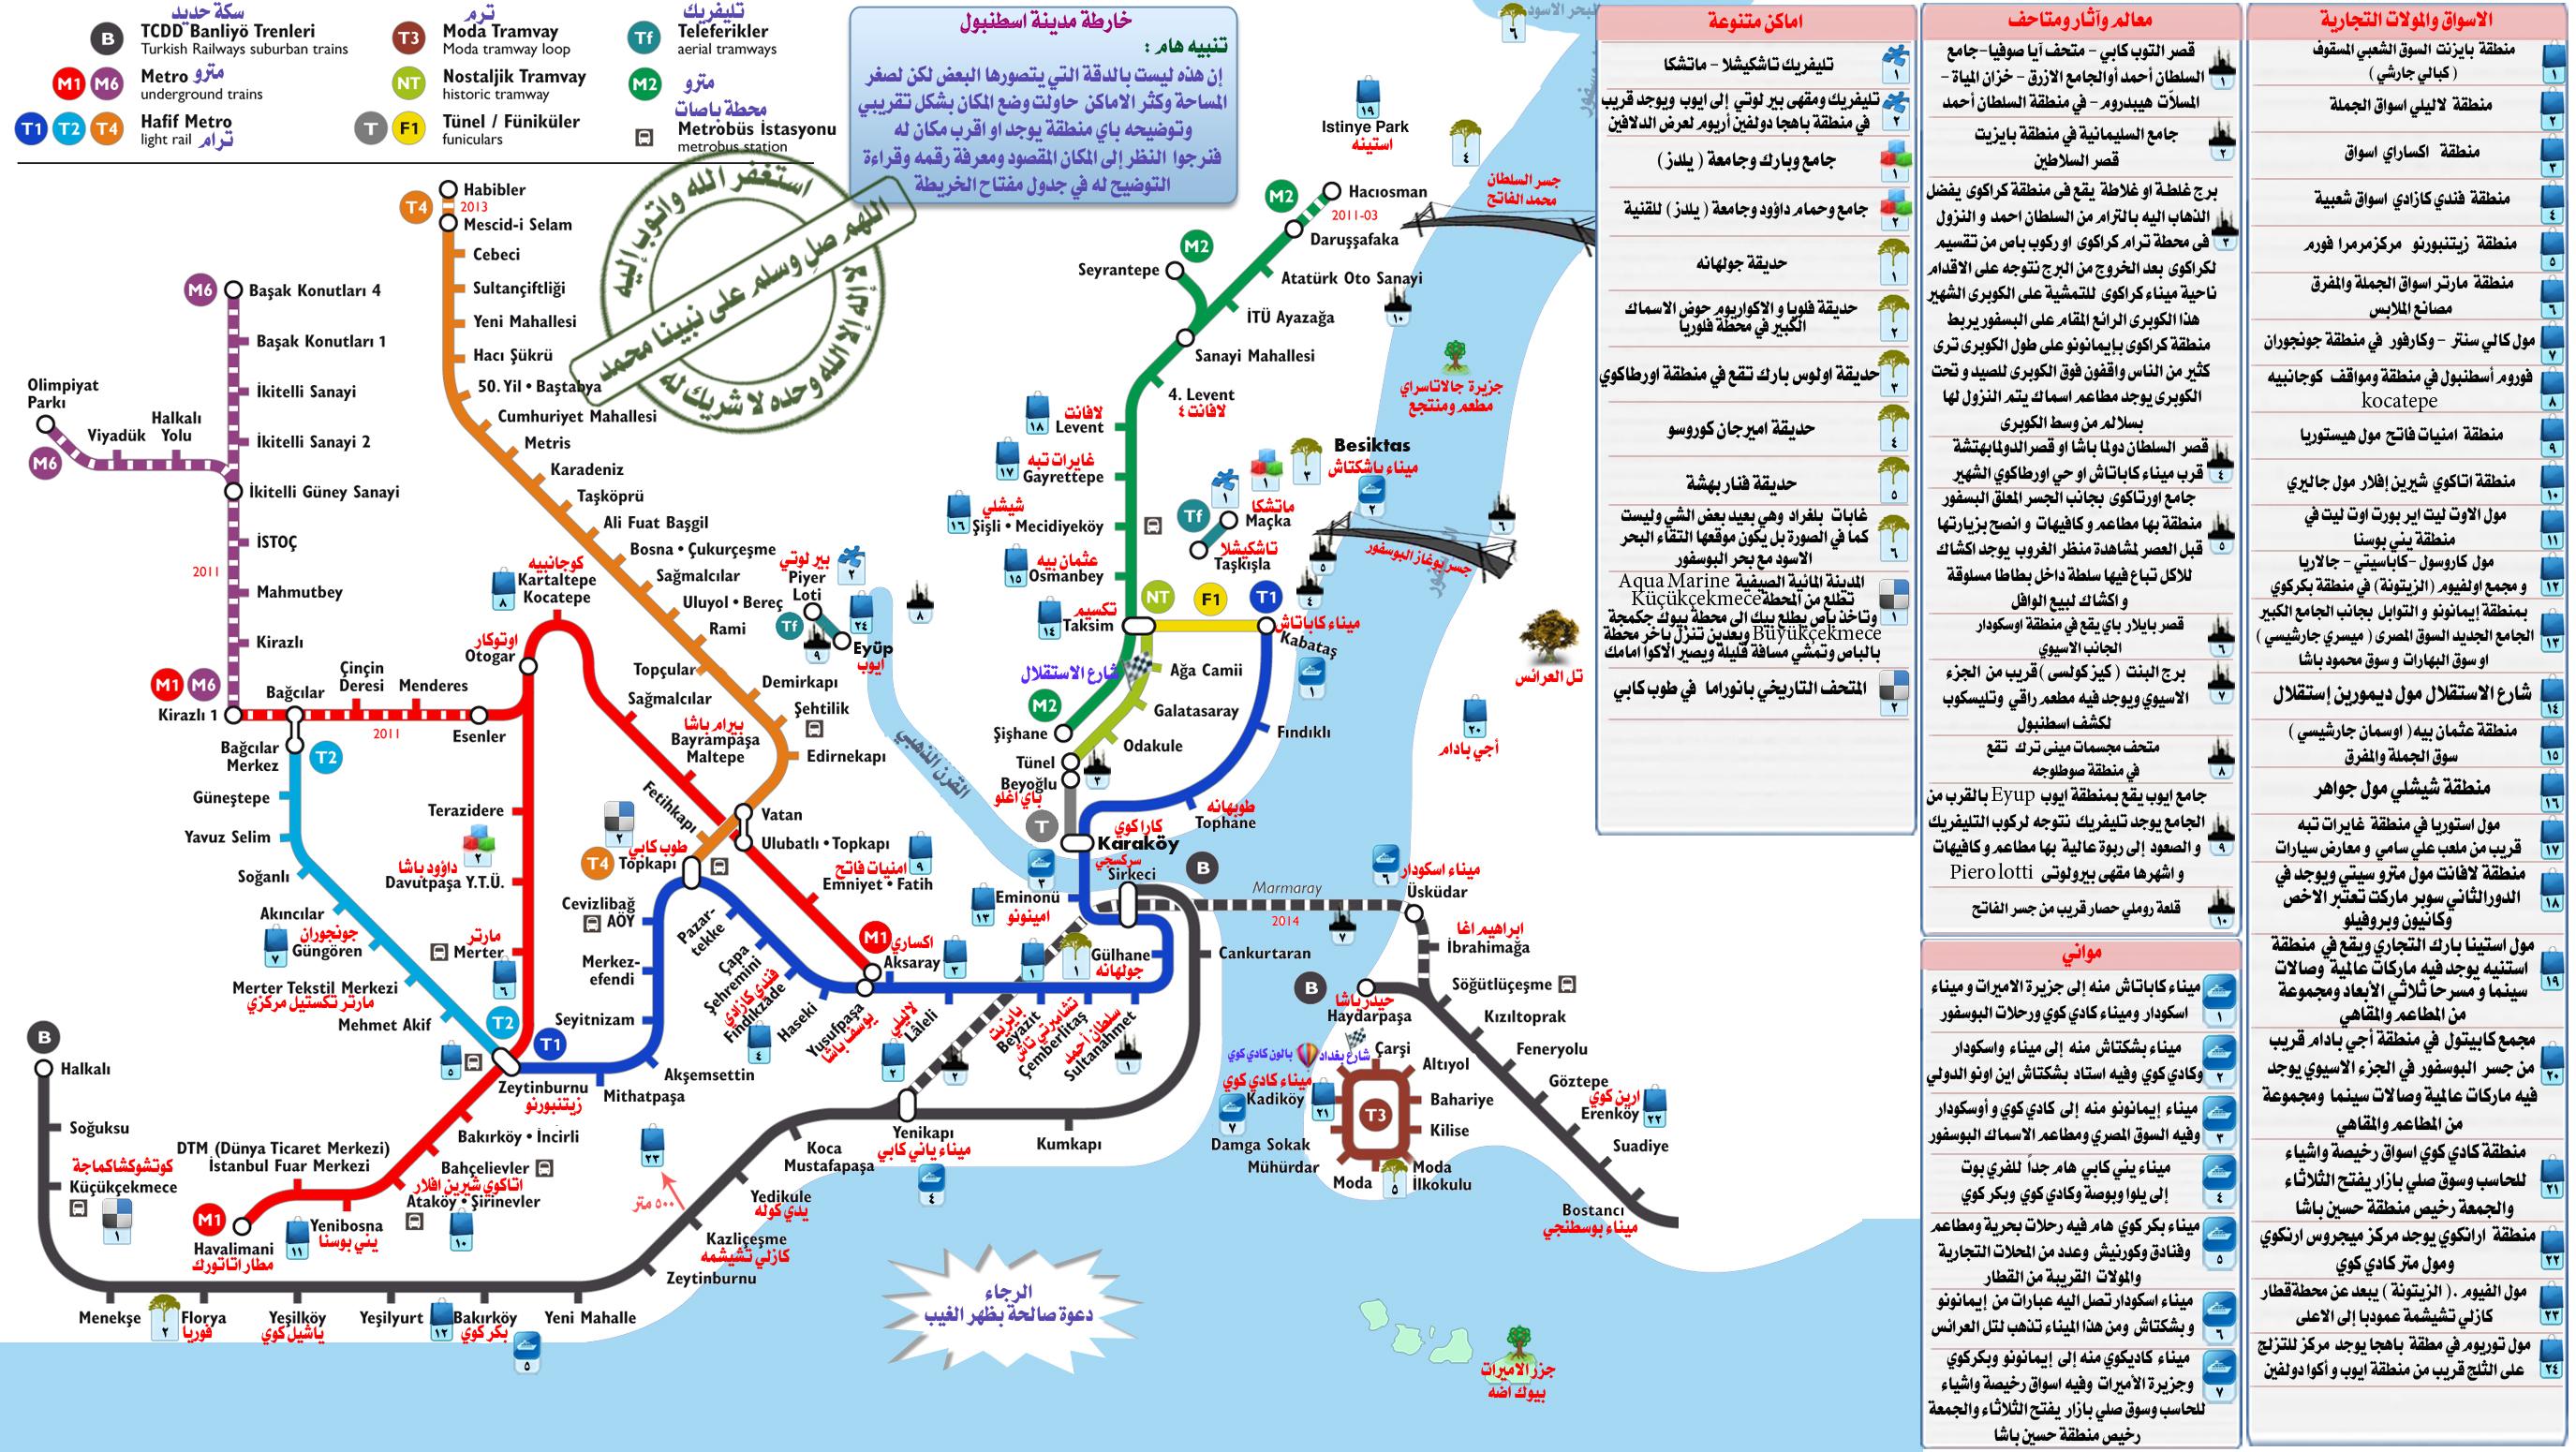 istanbul metro arabic - كيف تستخدم المترو ترام عبارة في اسطنبول ؟ شرح بالصور